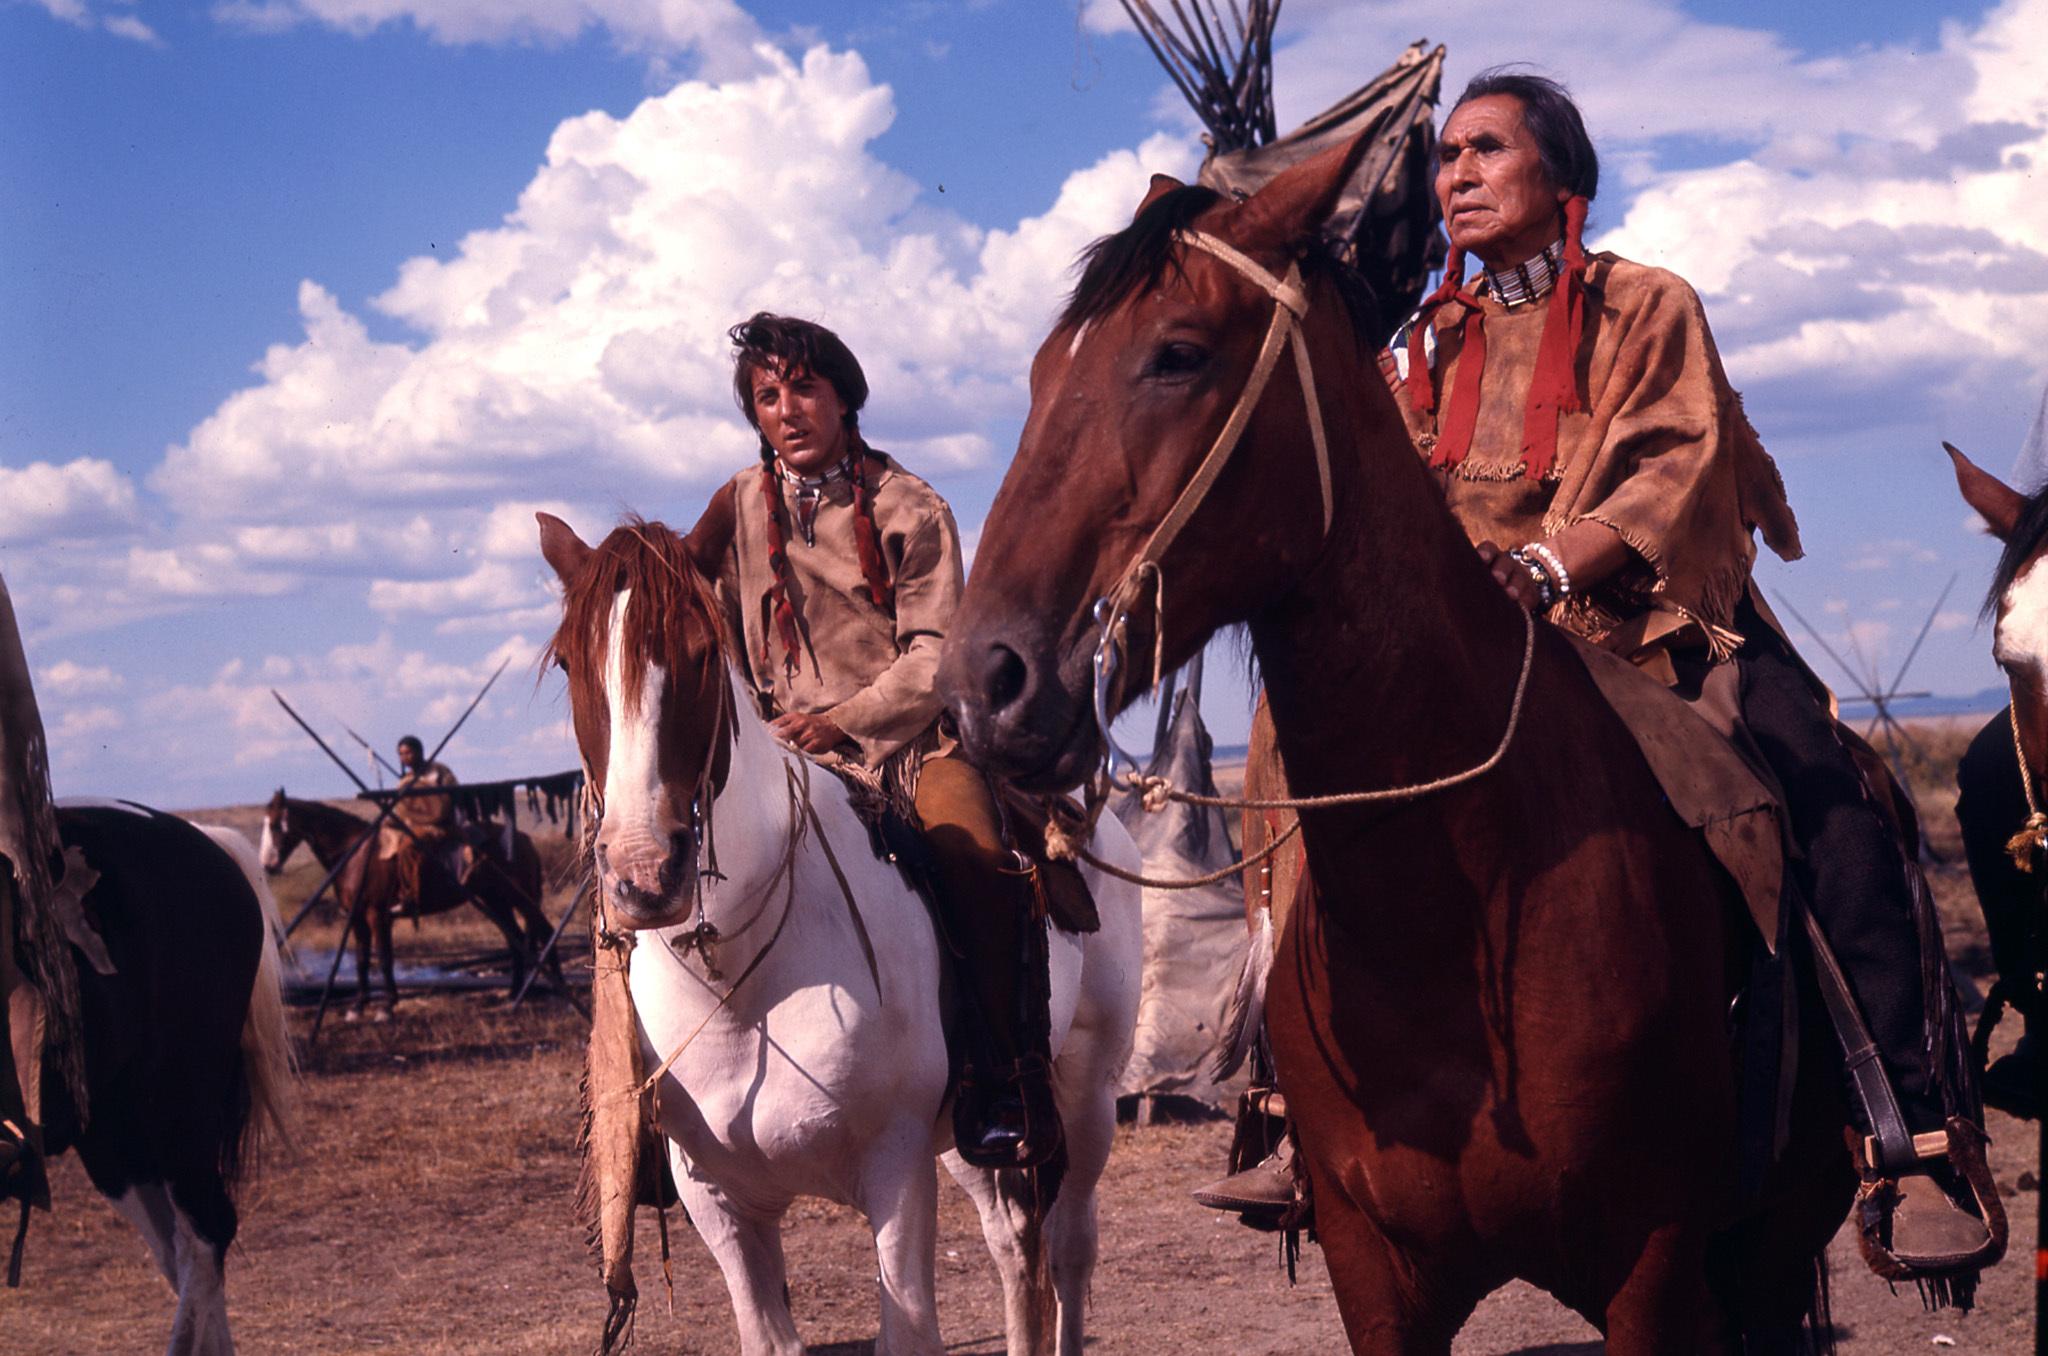 The 50 greatest westerns, best western movies, Little Big Man